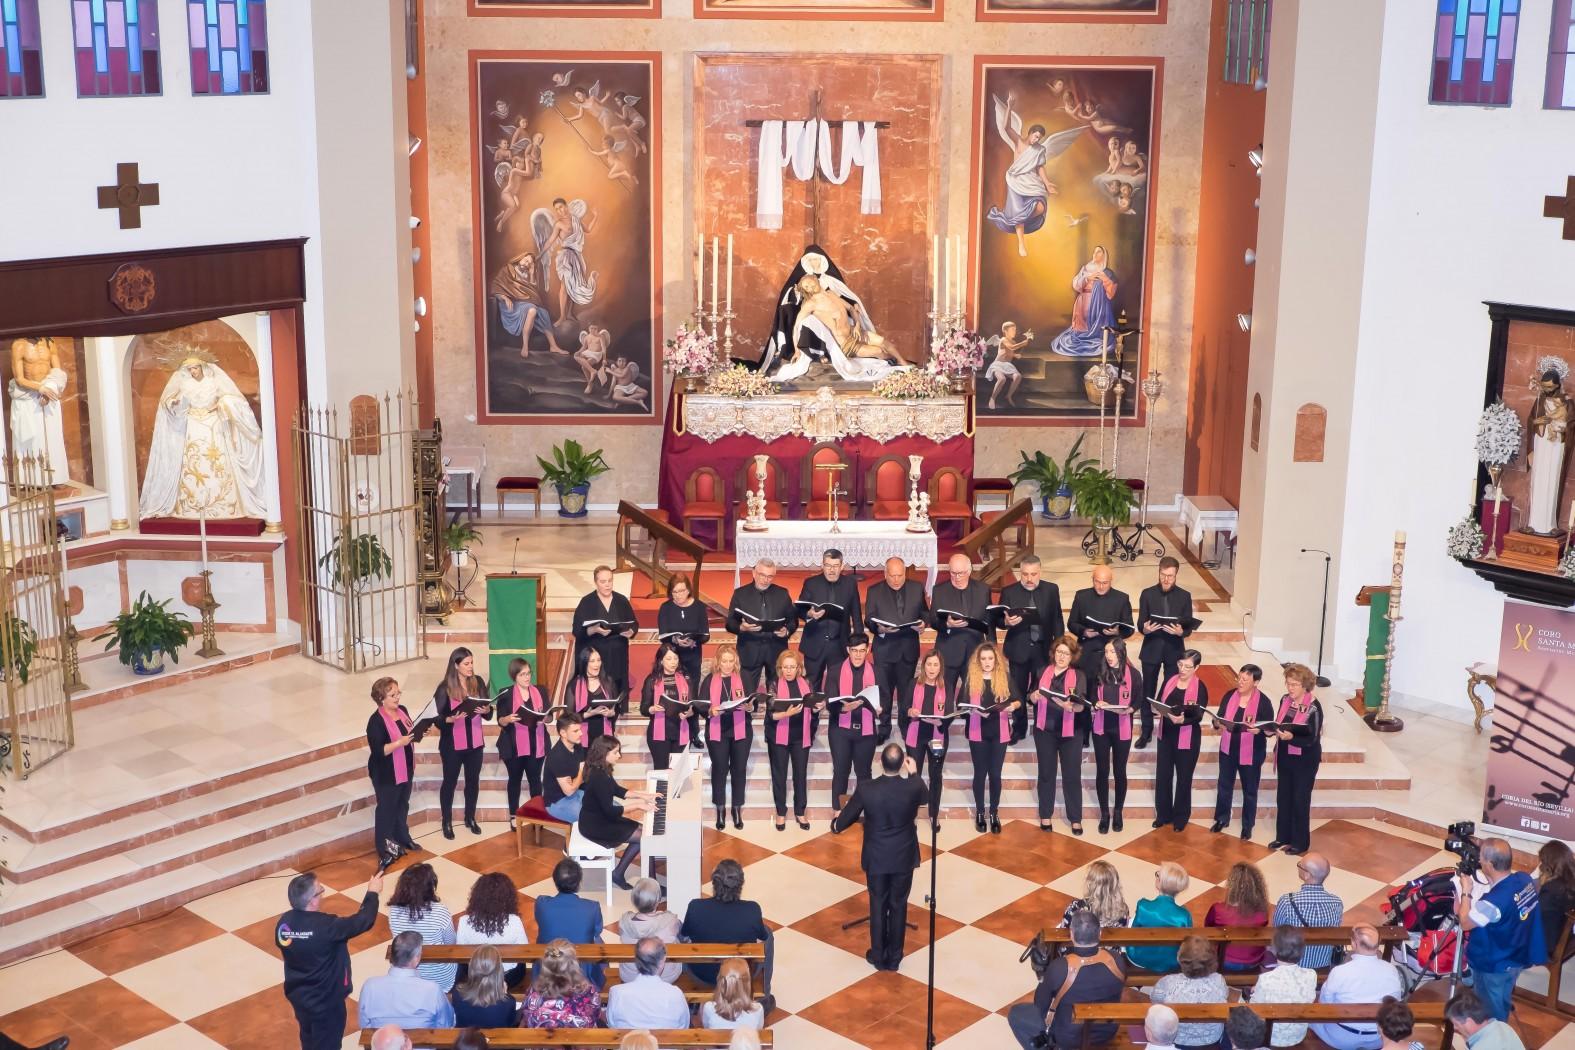 105-coro-santa-maria-090618